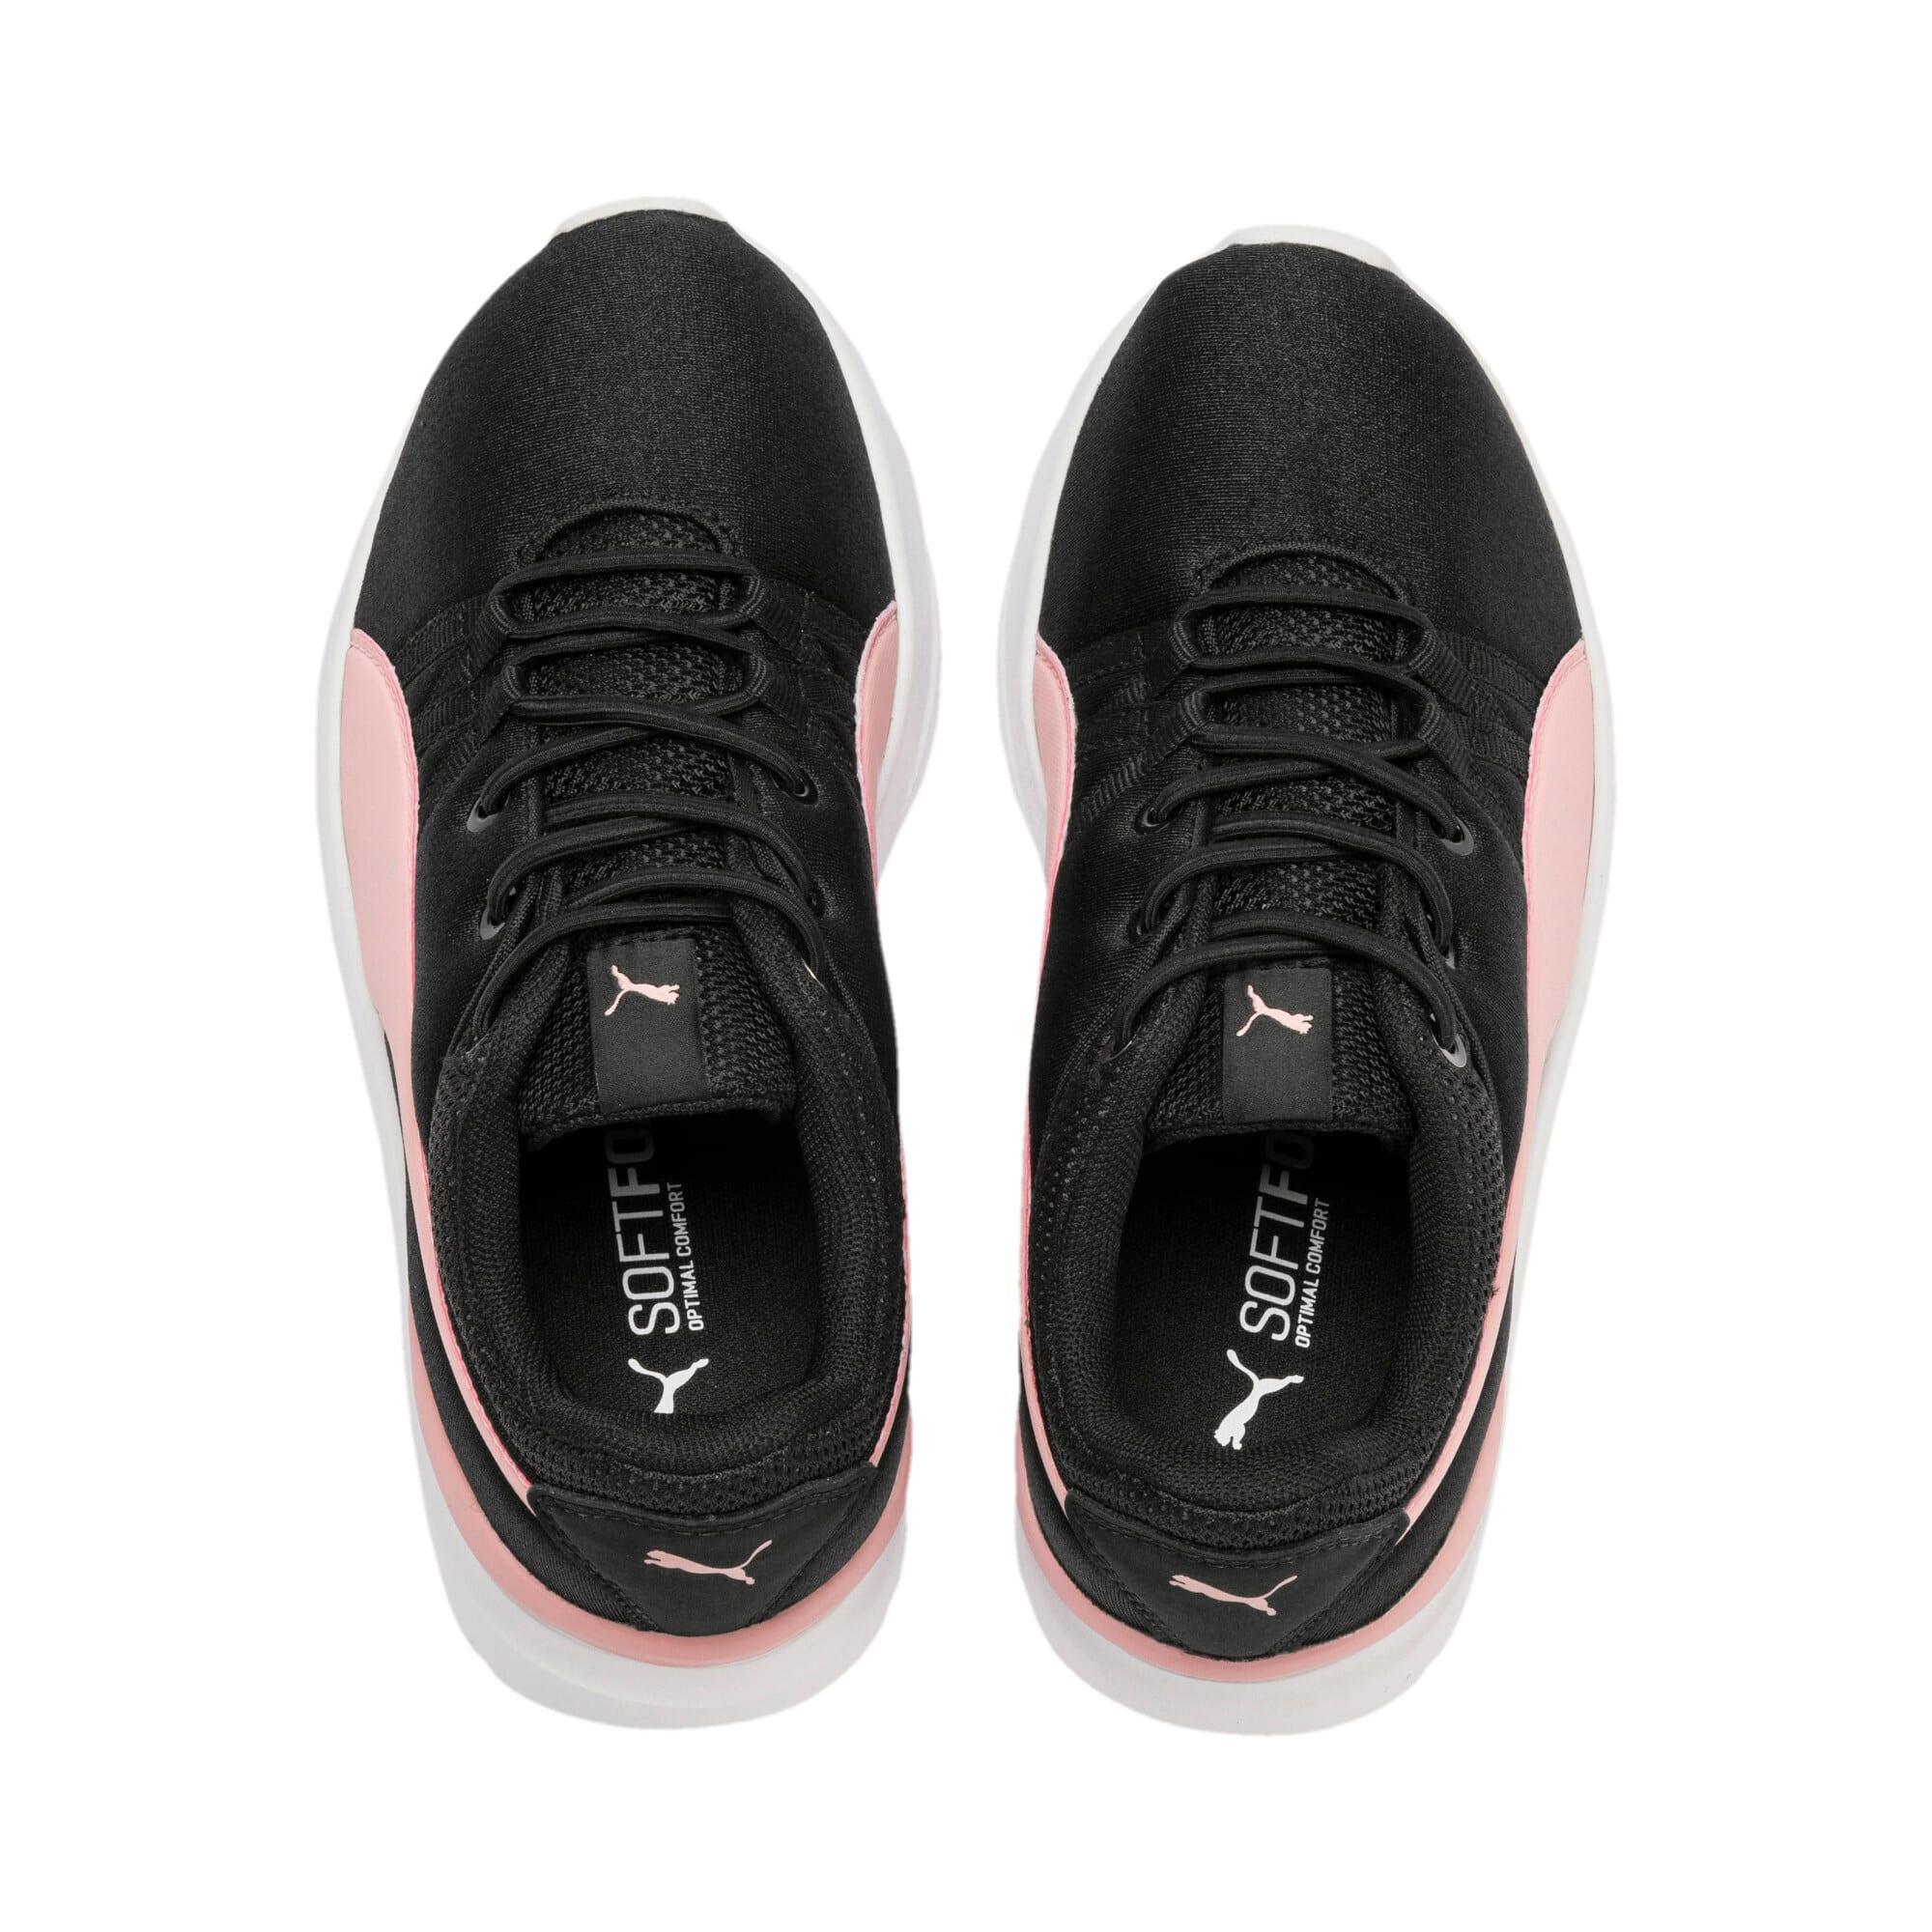 Thumbnail 6 of Adela AC Girl's Little Kids' Shoes, Puma Black-Bridal Rose, medium